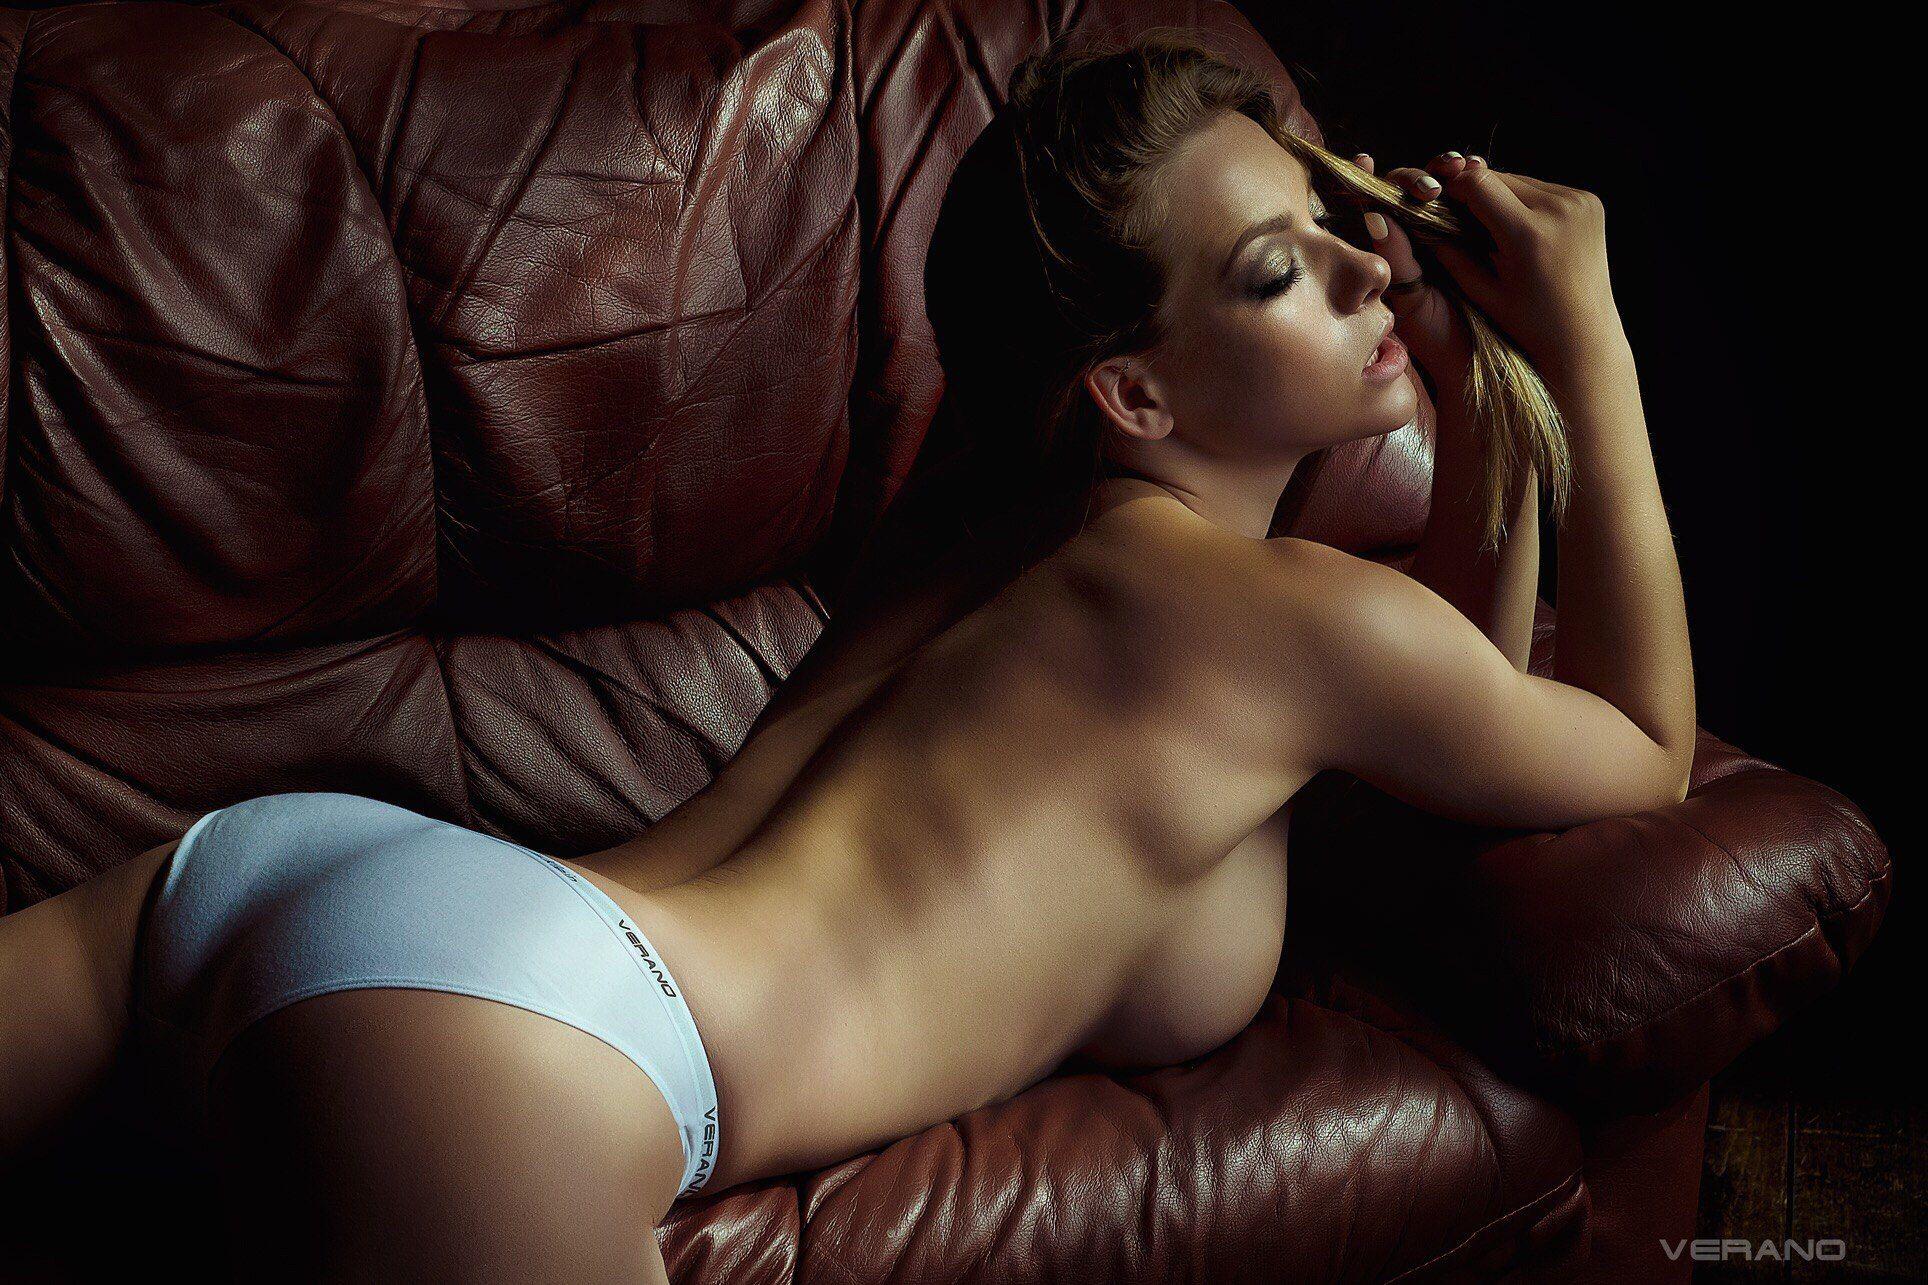 Bikini Olga Kobzar nudes (33 foto and video), Pussy, Sideboobs, Boobs, cameltoe 2006